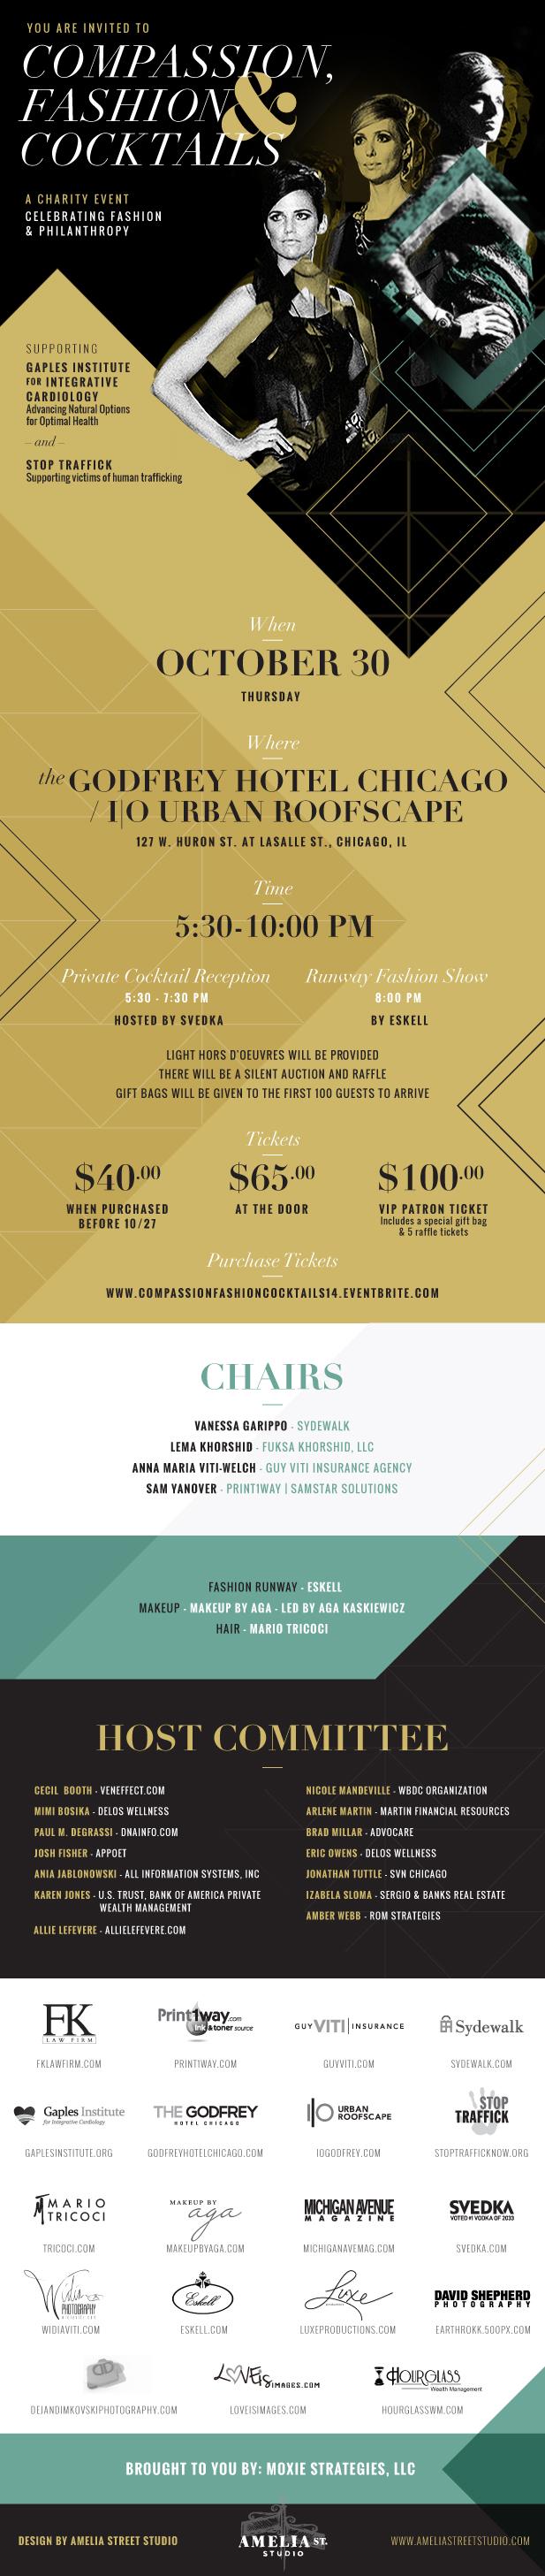 Compassion, Fashion & Cocktails 2014 Charity Event Invitation 10-30-14